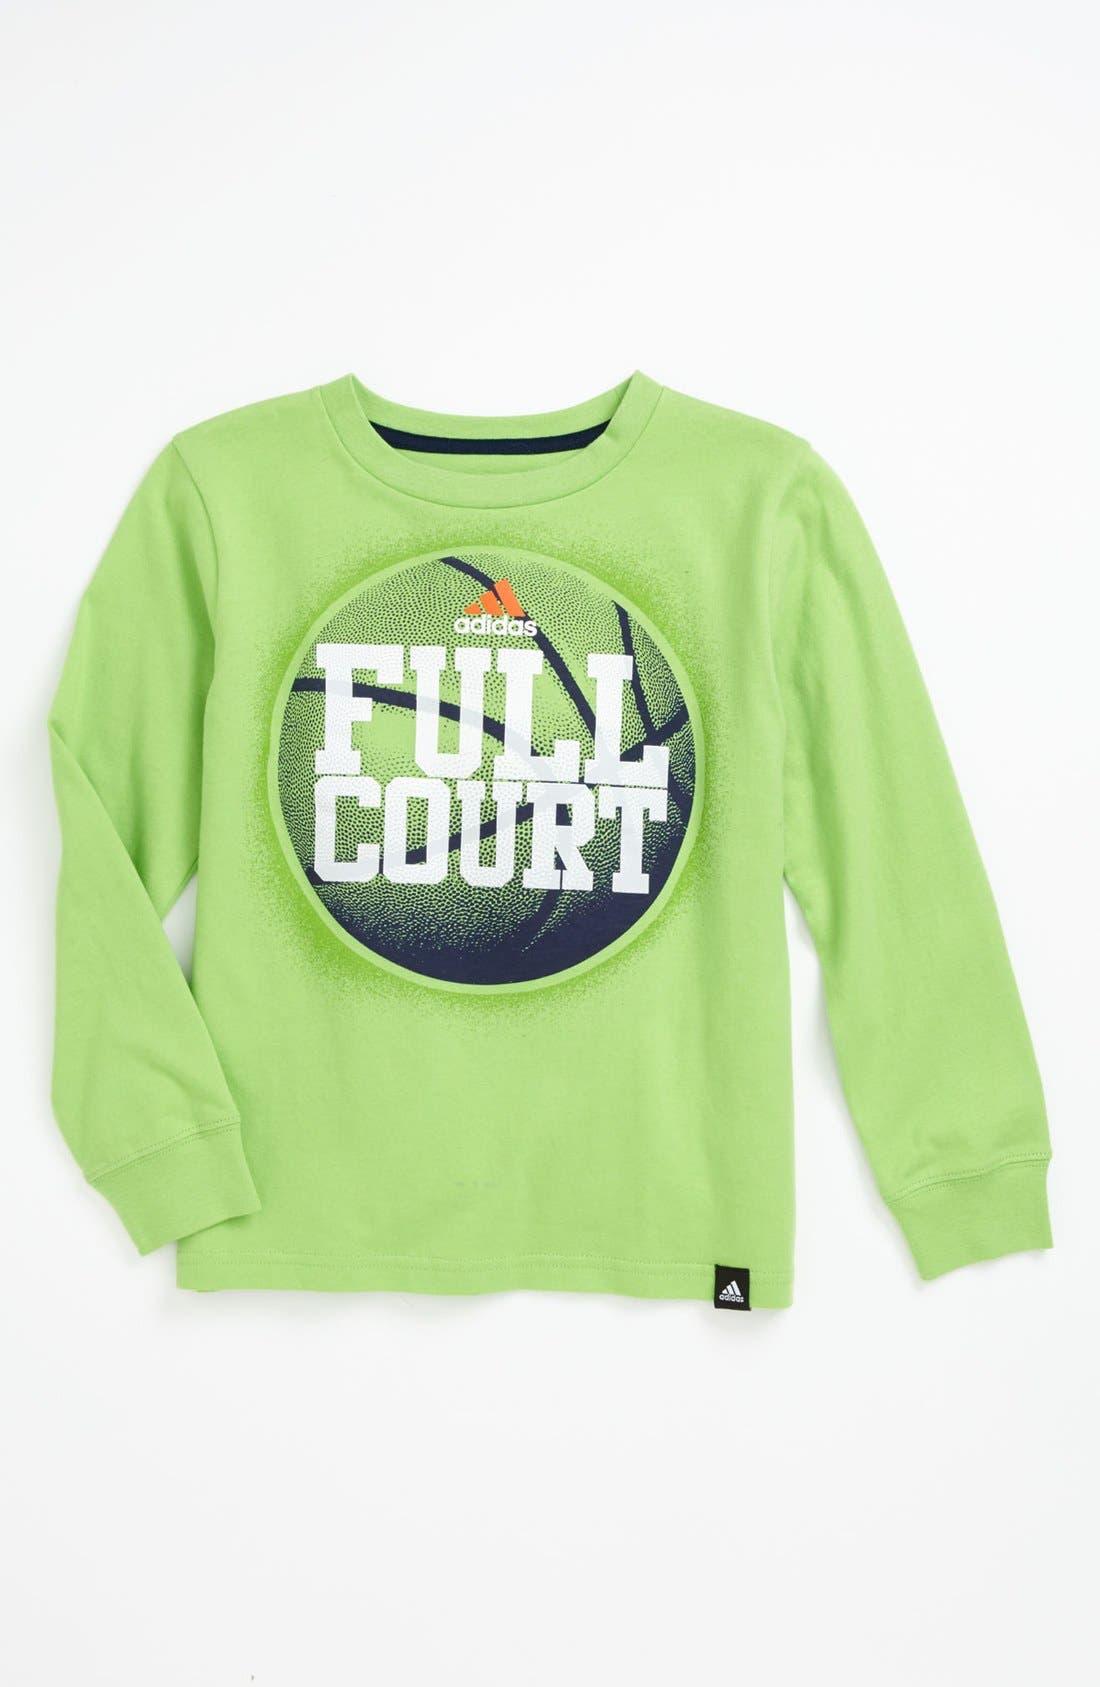 Alternate Image 1 Selected - adidas 'Full Court' Long Sleeve Tee (Little Boys)